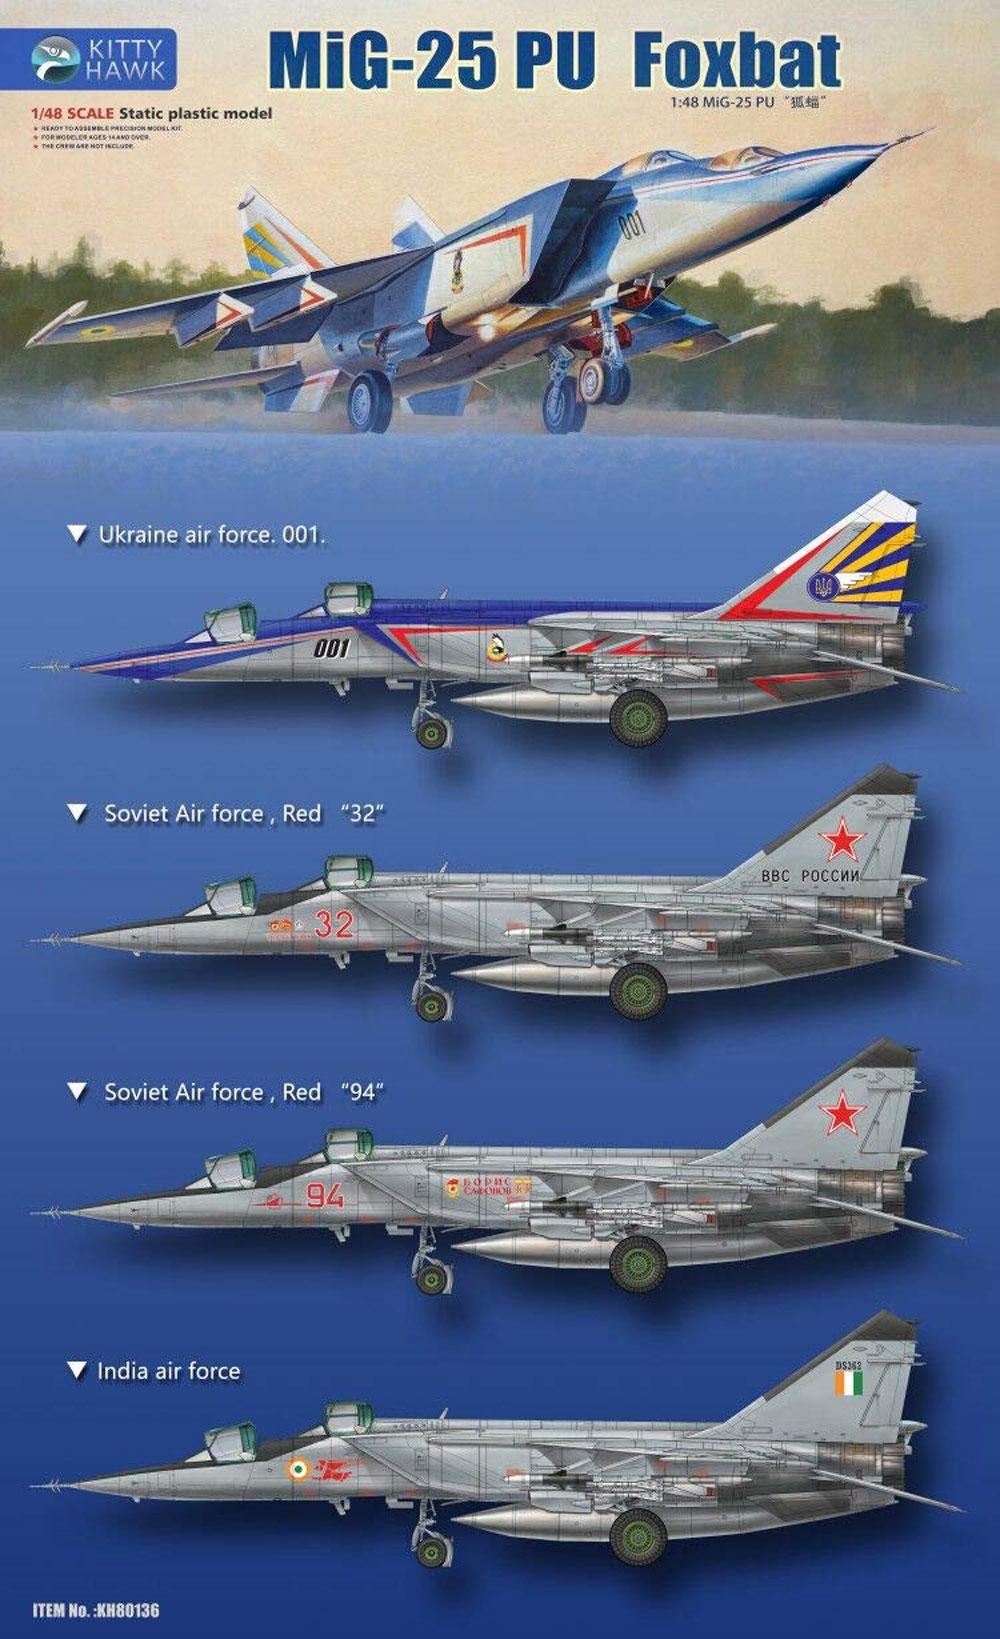 MiG-25PU フォックスバットプラモデル(キティホーク1/48 ミリタリーエアクラフト プラモデルNo.KH80136)商品画像_2